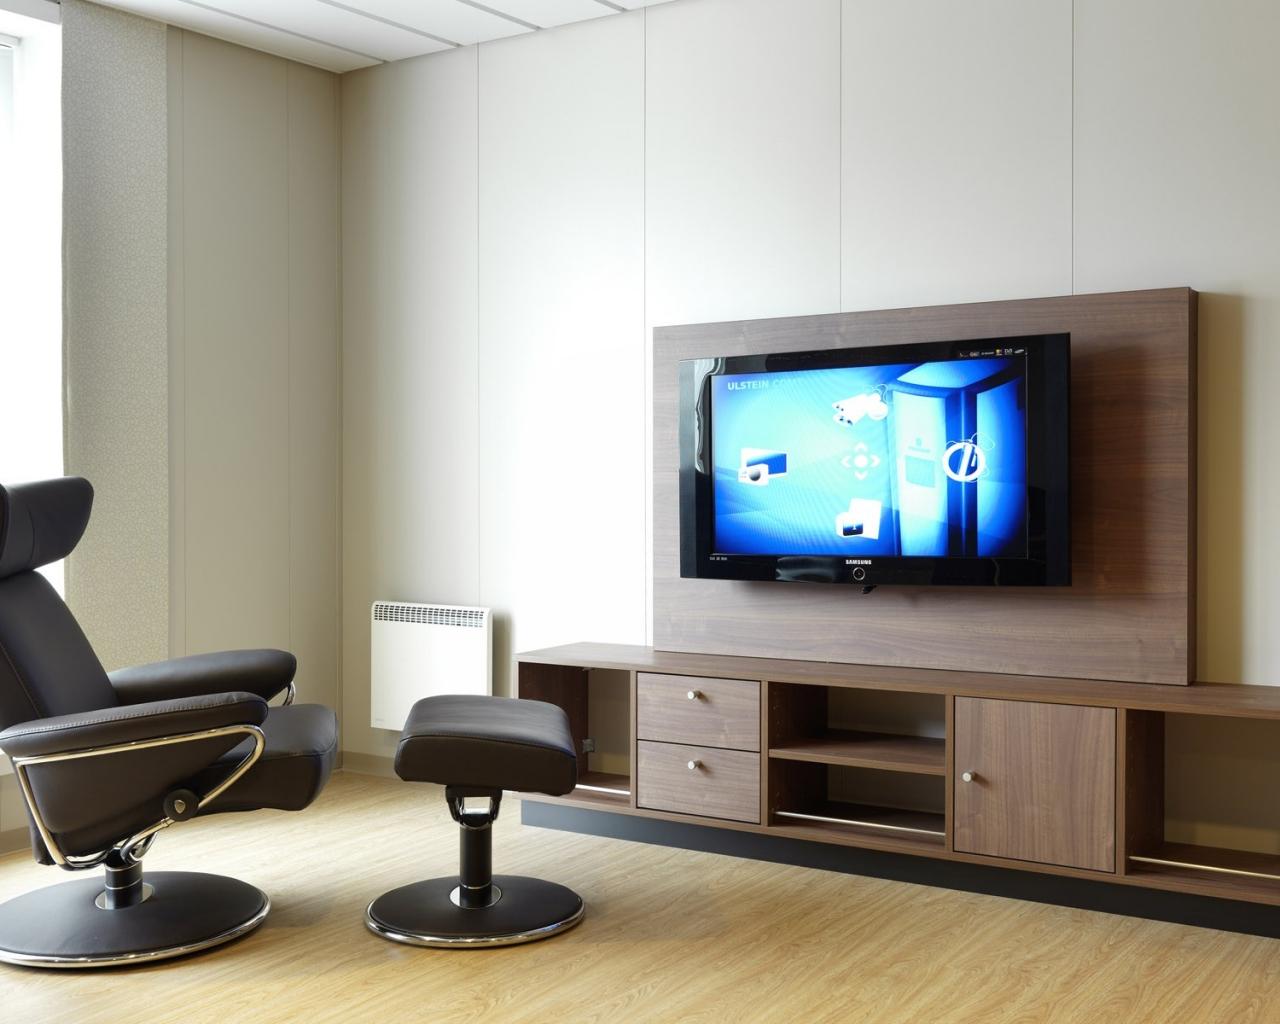 Dise o de sala de televisi n hd 1280x1024 imagenes for Disenos de interiores para salas